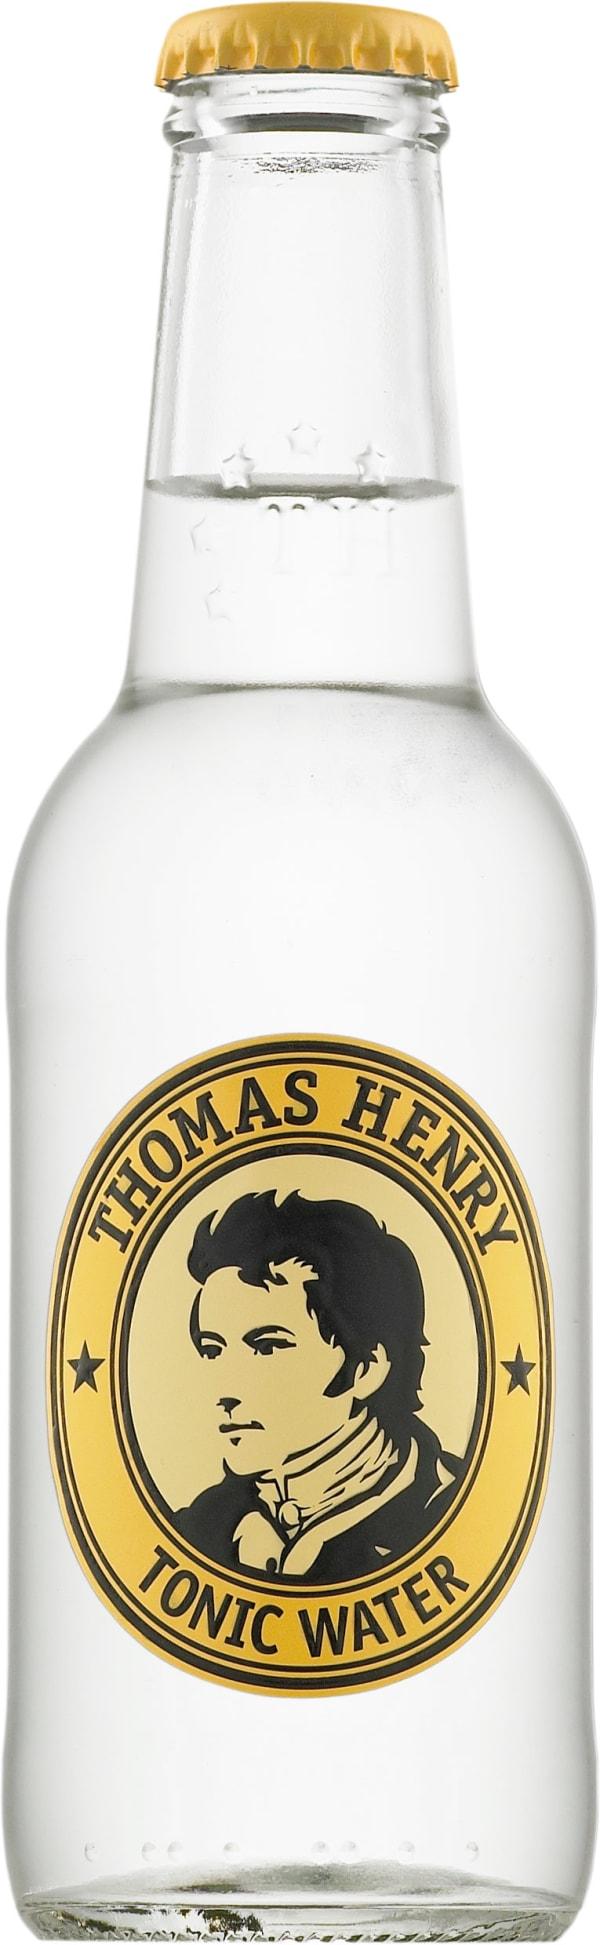 Thomas Henry Tonic Water